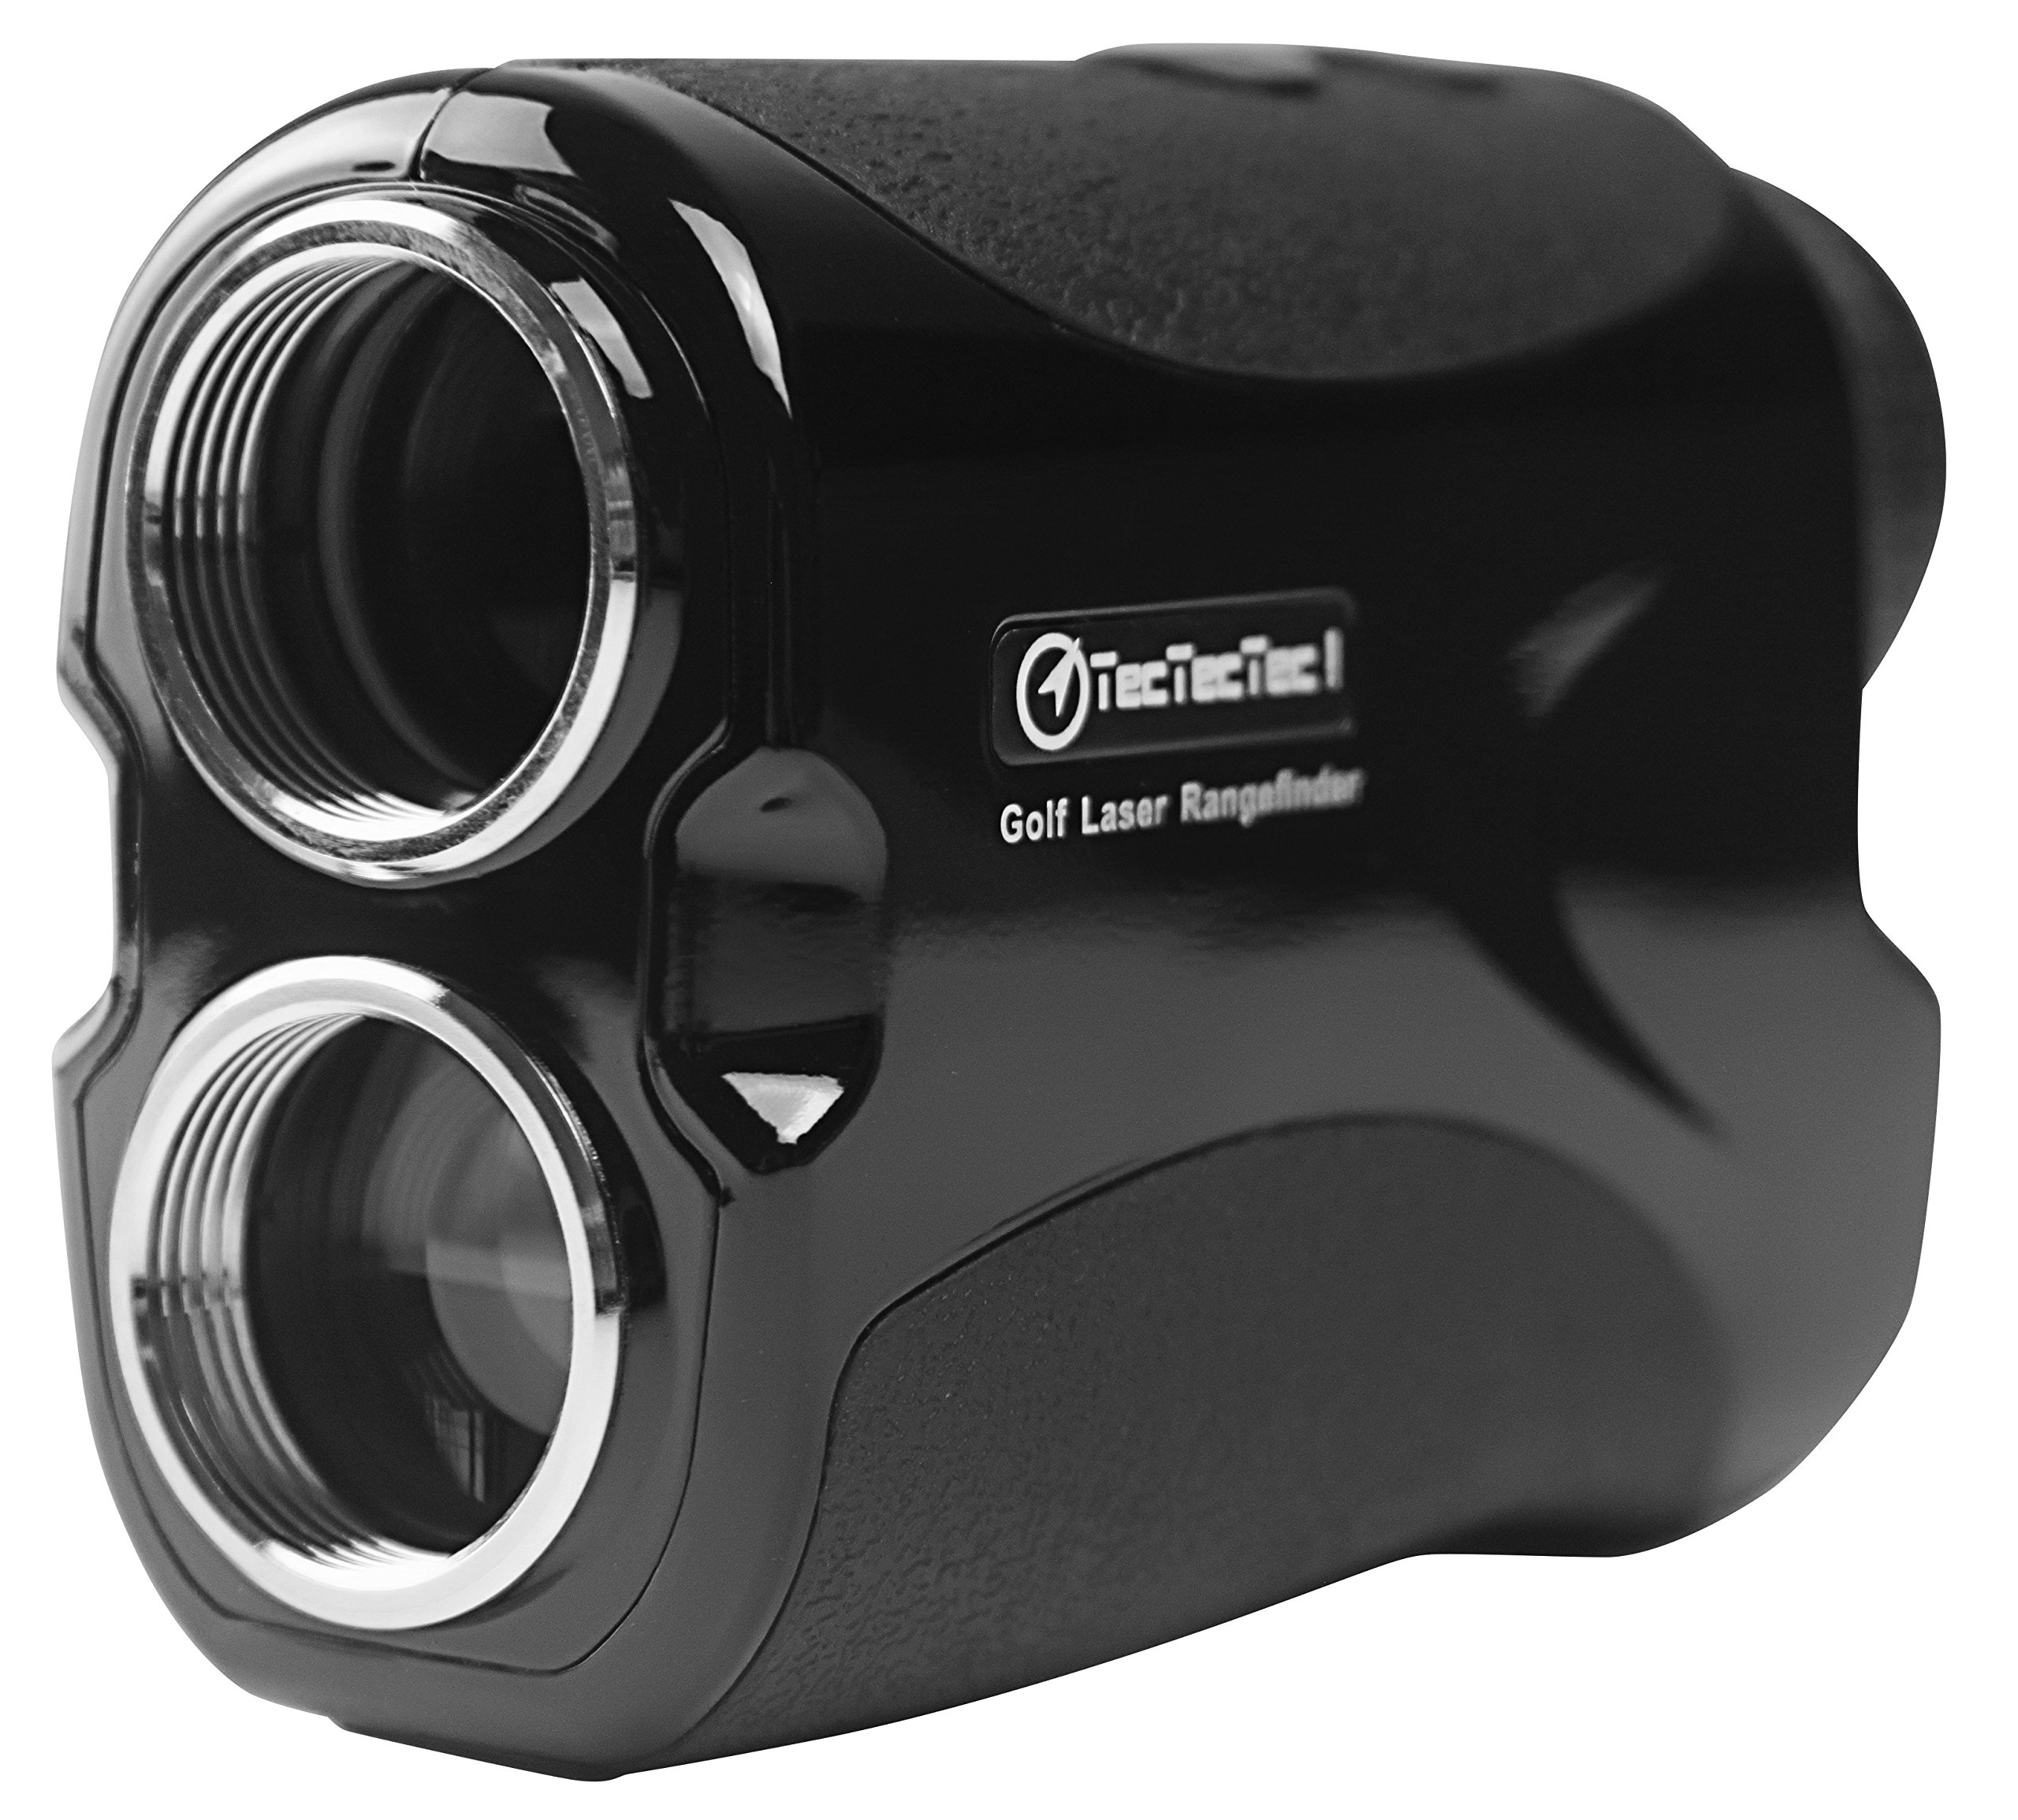 TecTecTec VPRO500 Golf Rangefinder - Laser Range Finder with Pinsensor - Laser Binoculars - with Battery by TecTecTec